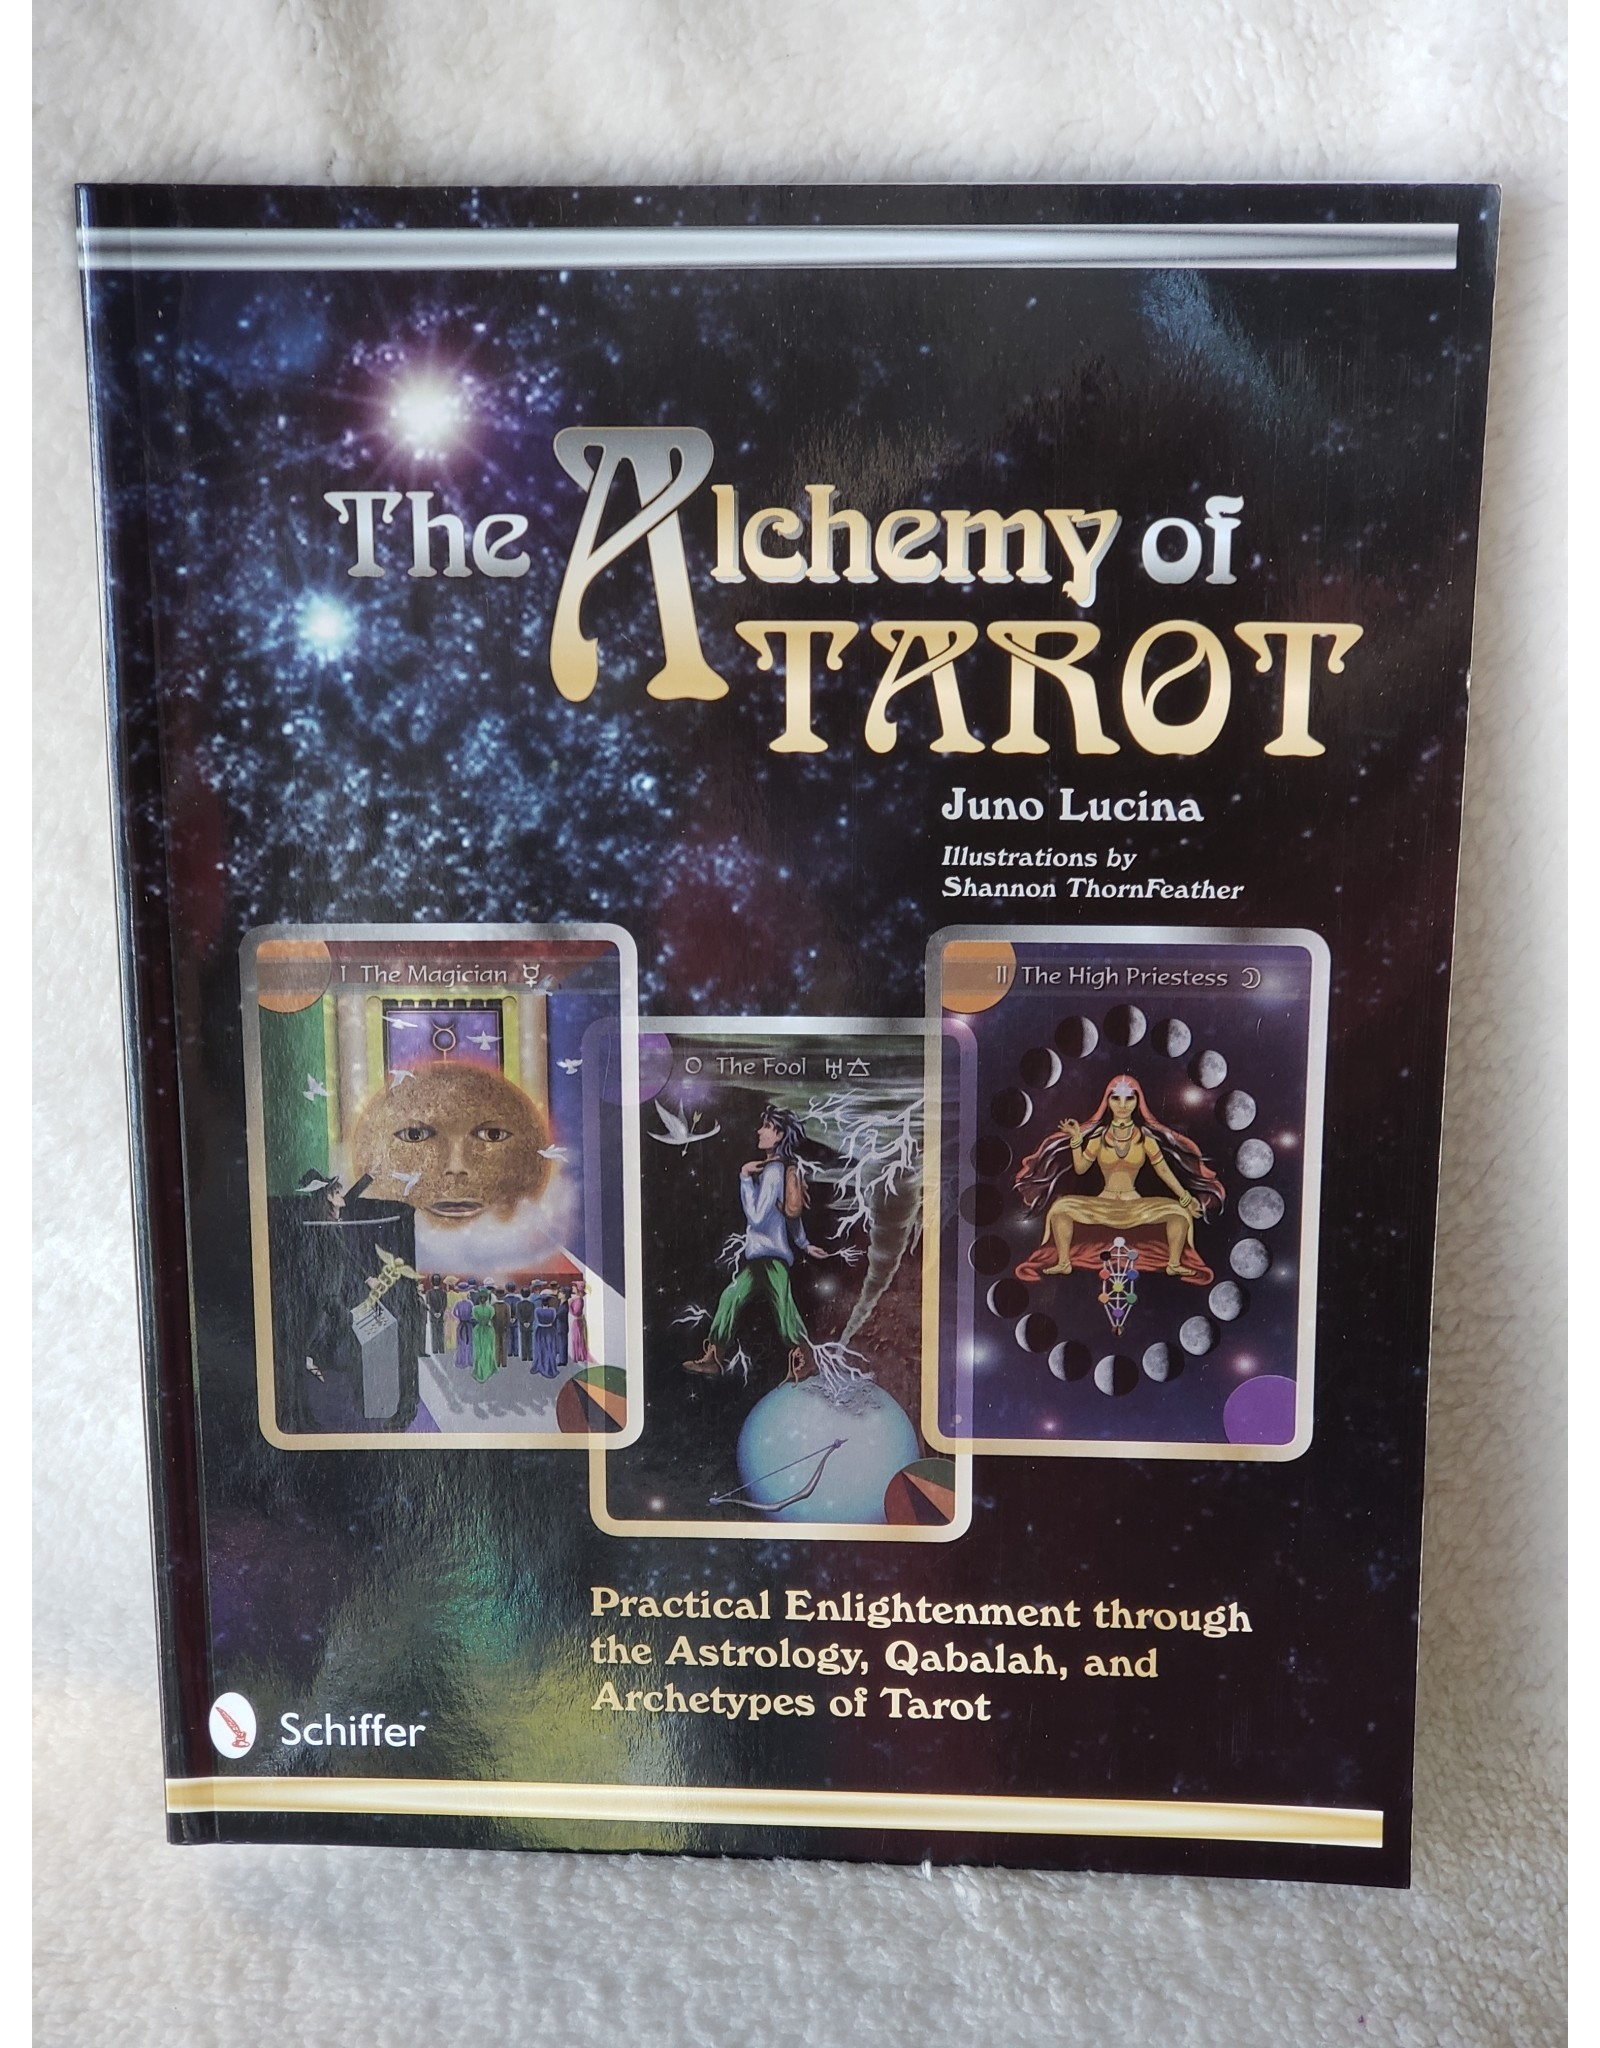 The Alchemy of Tarot